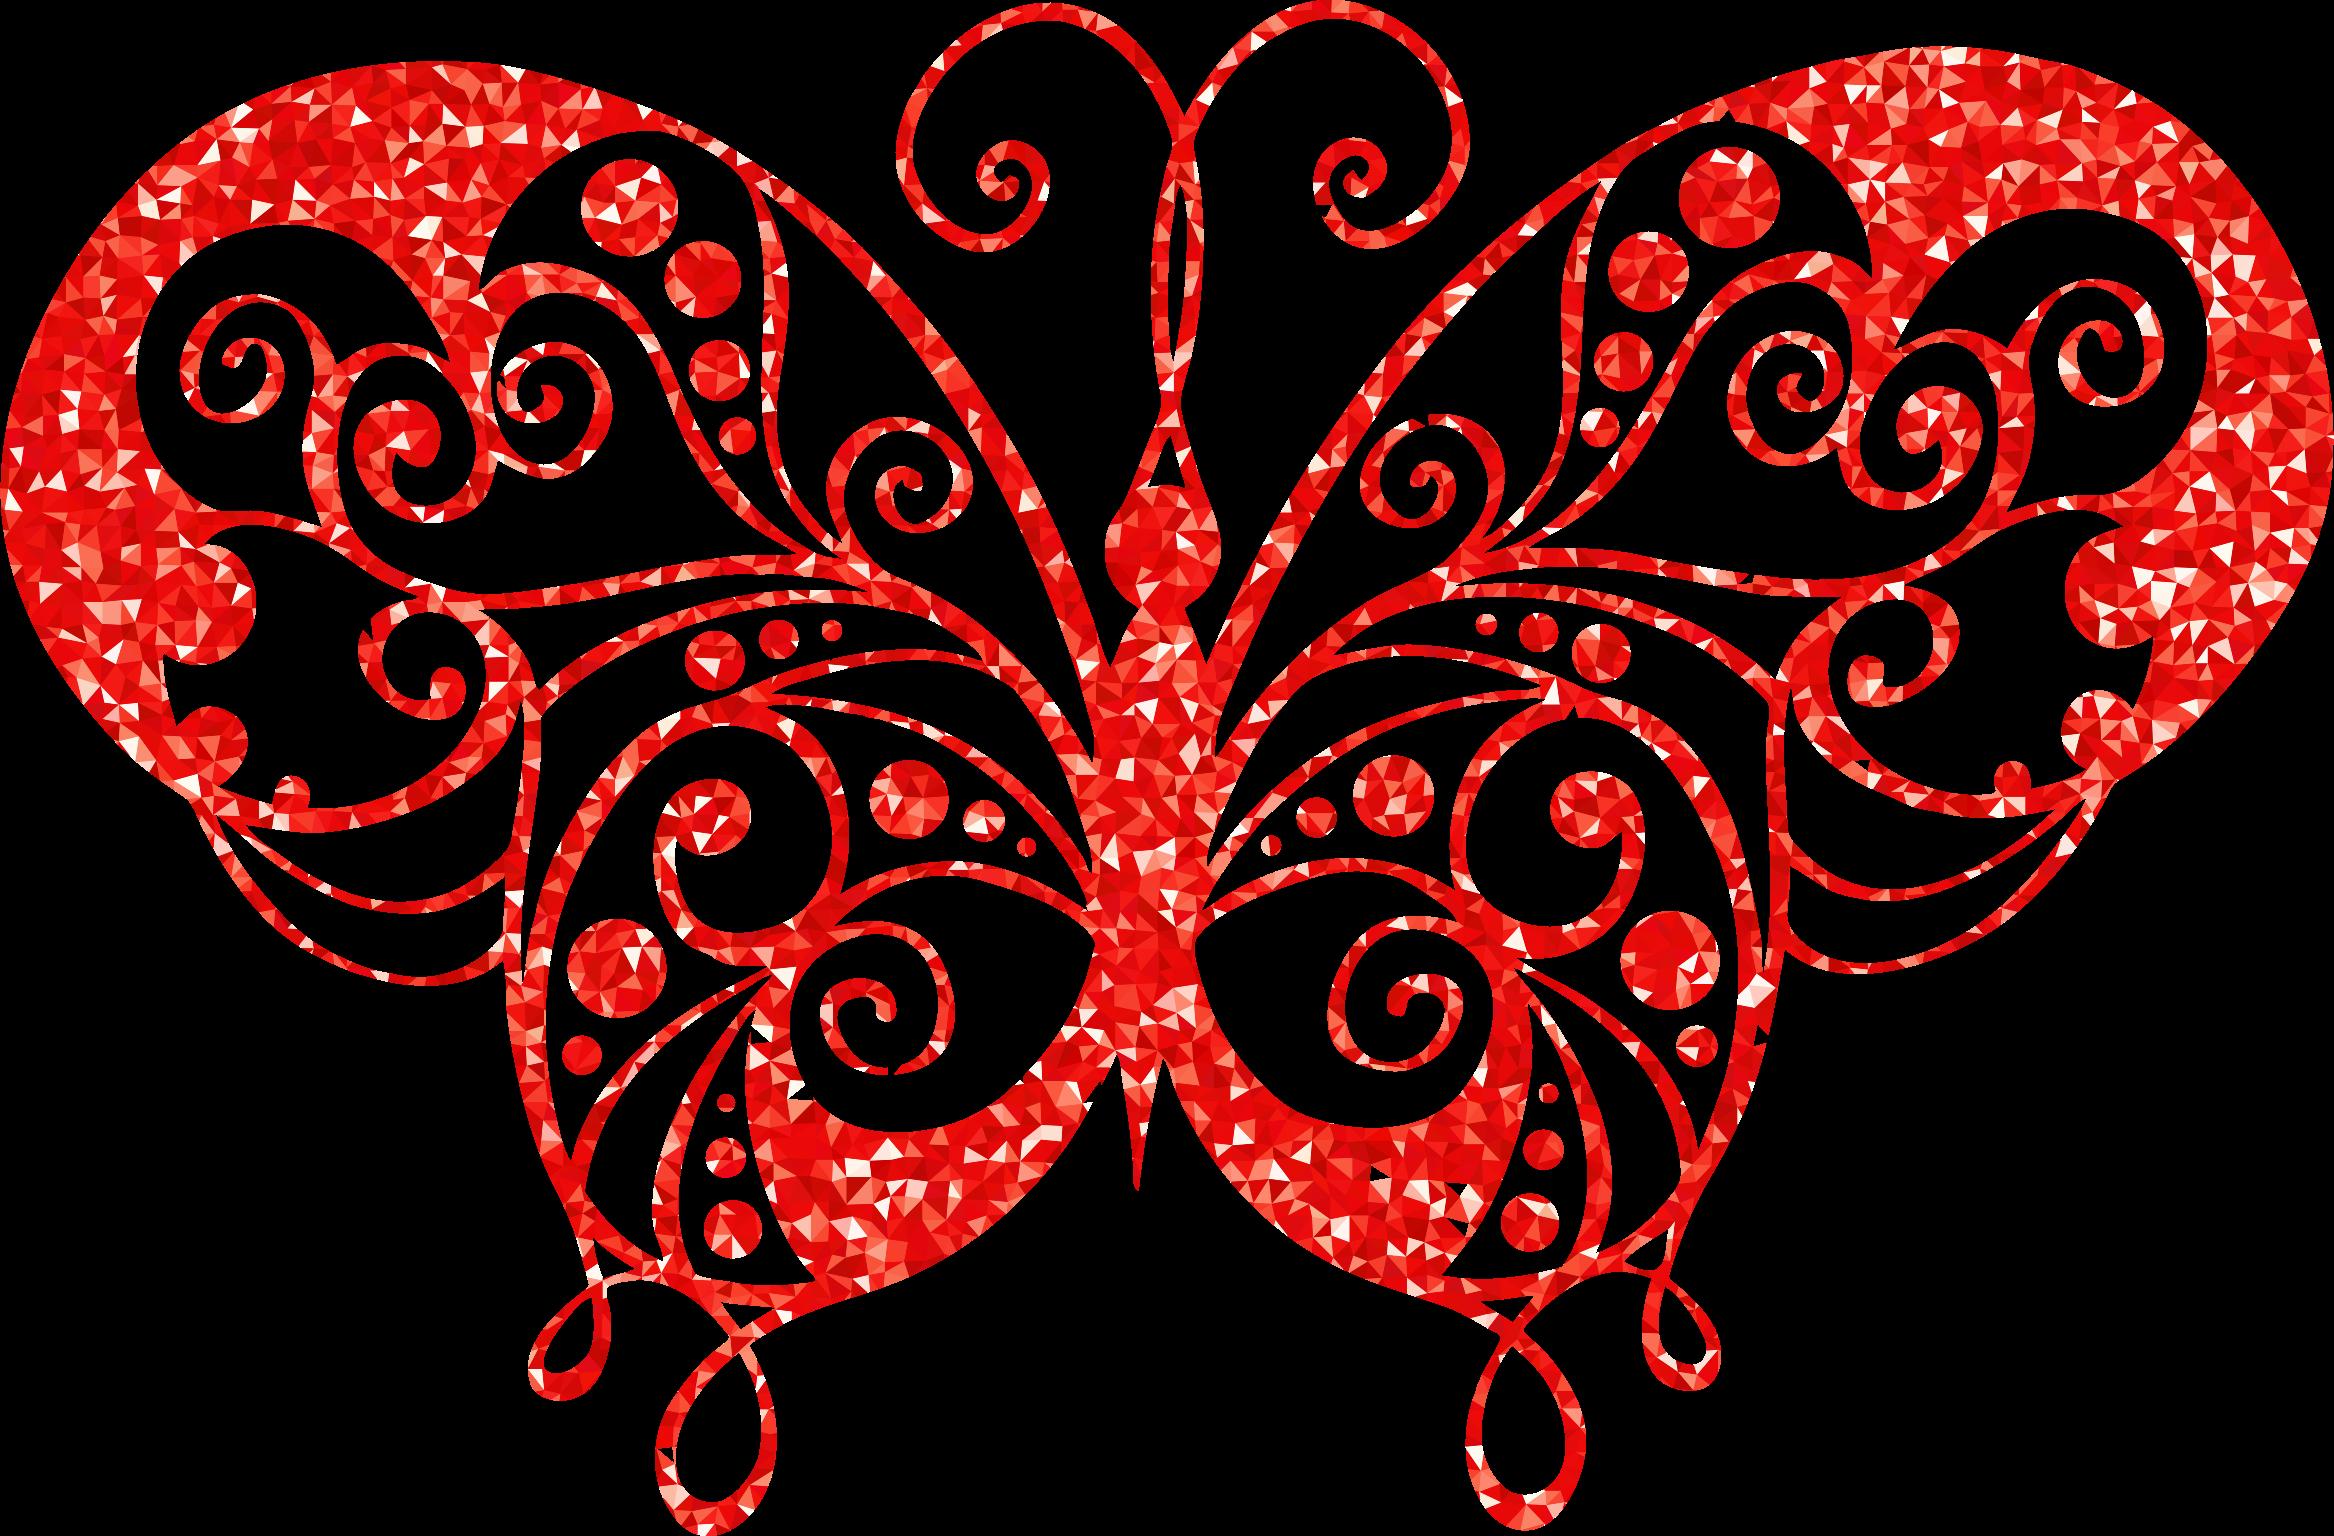 Ruby high detail flourish. Flourishes clipart red swirl